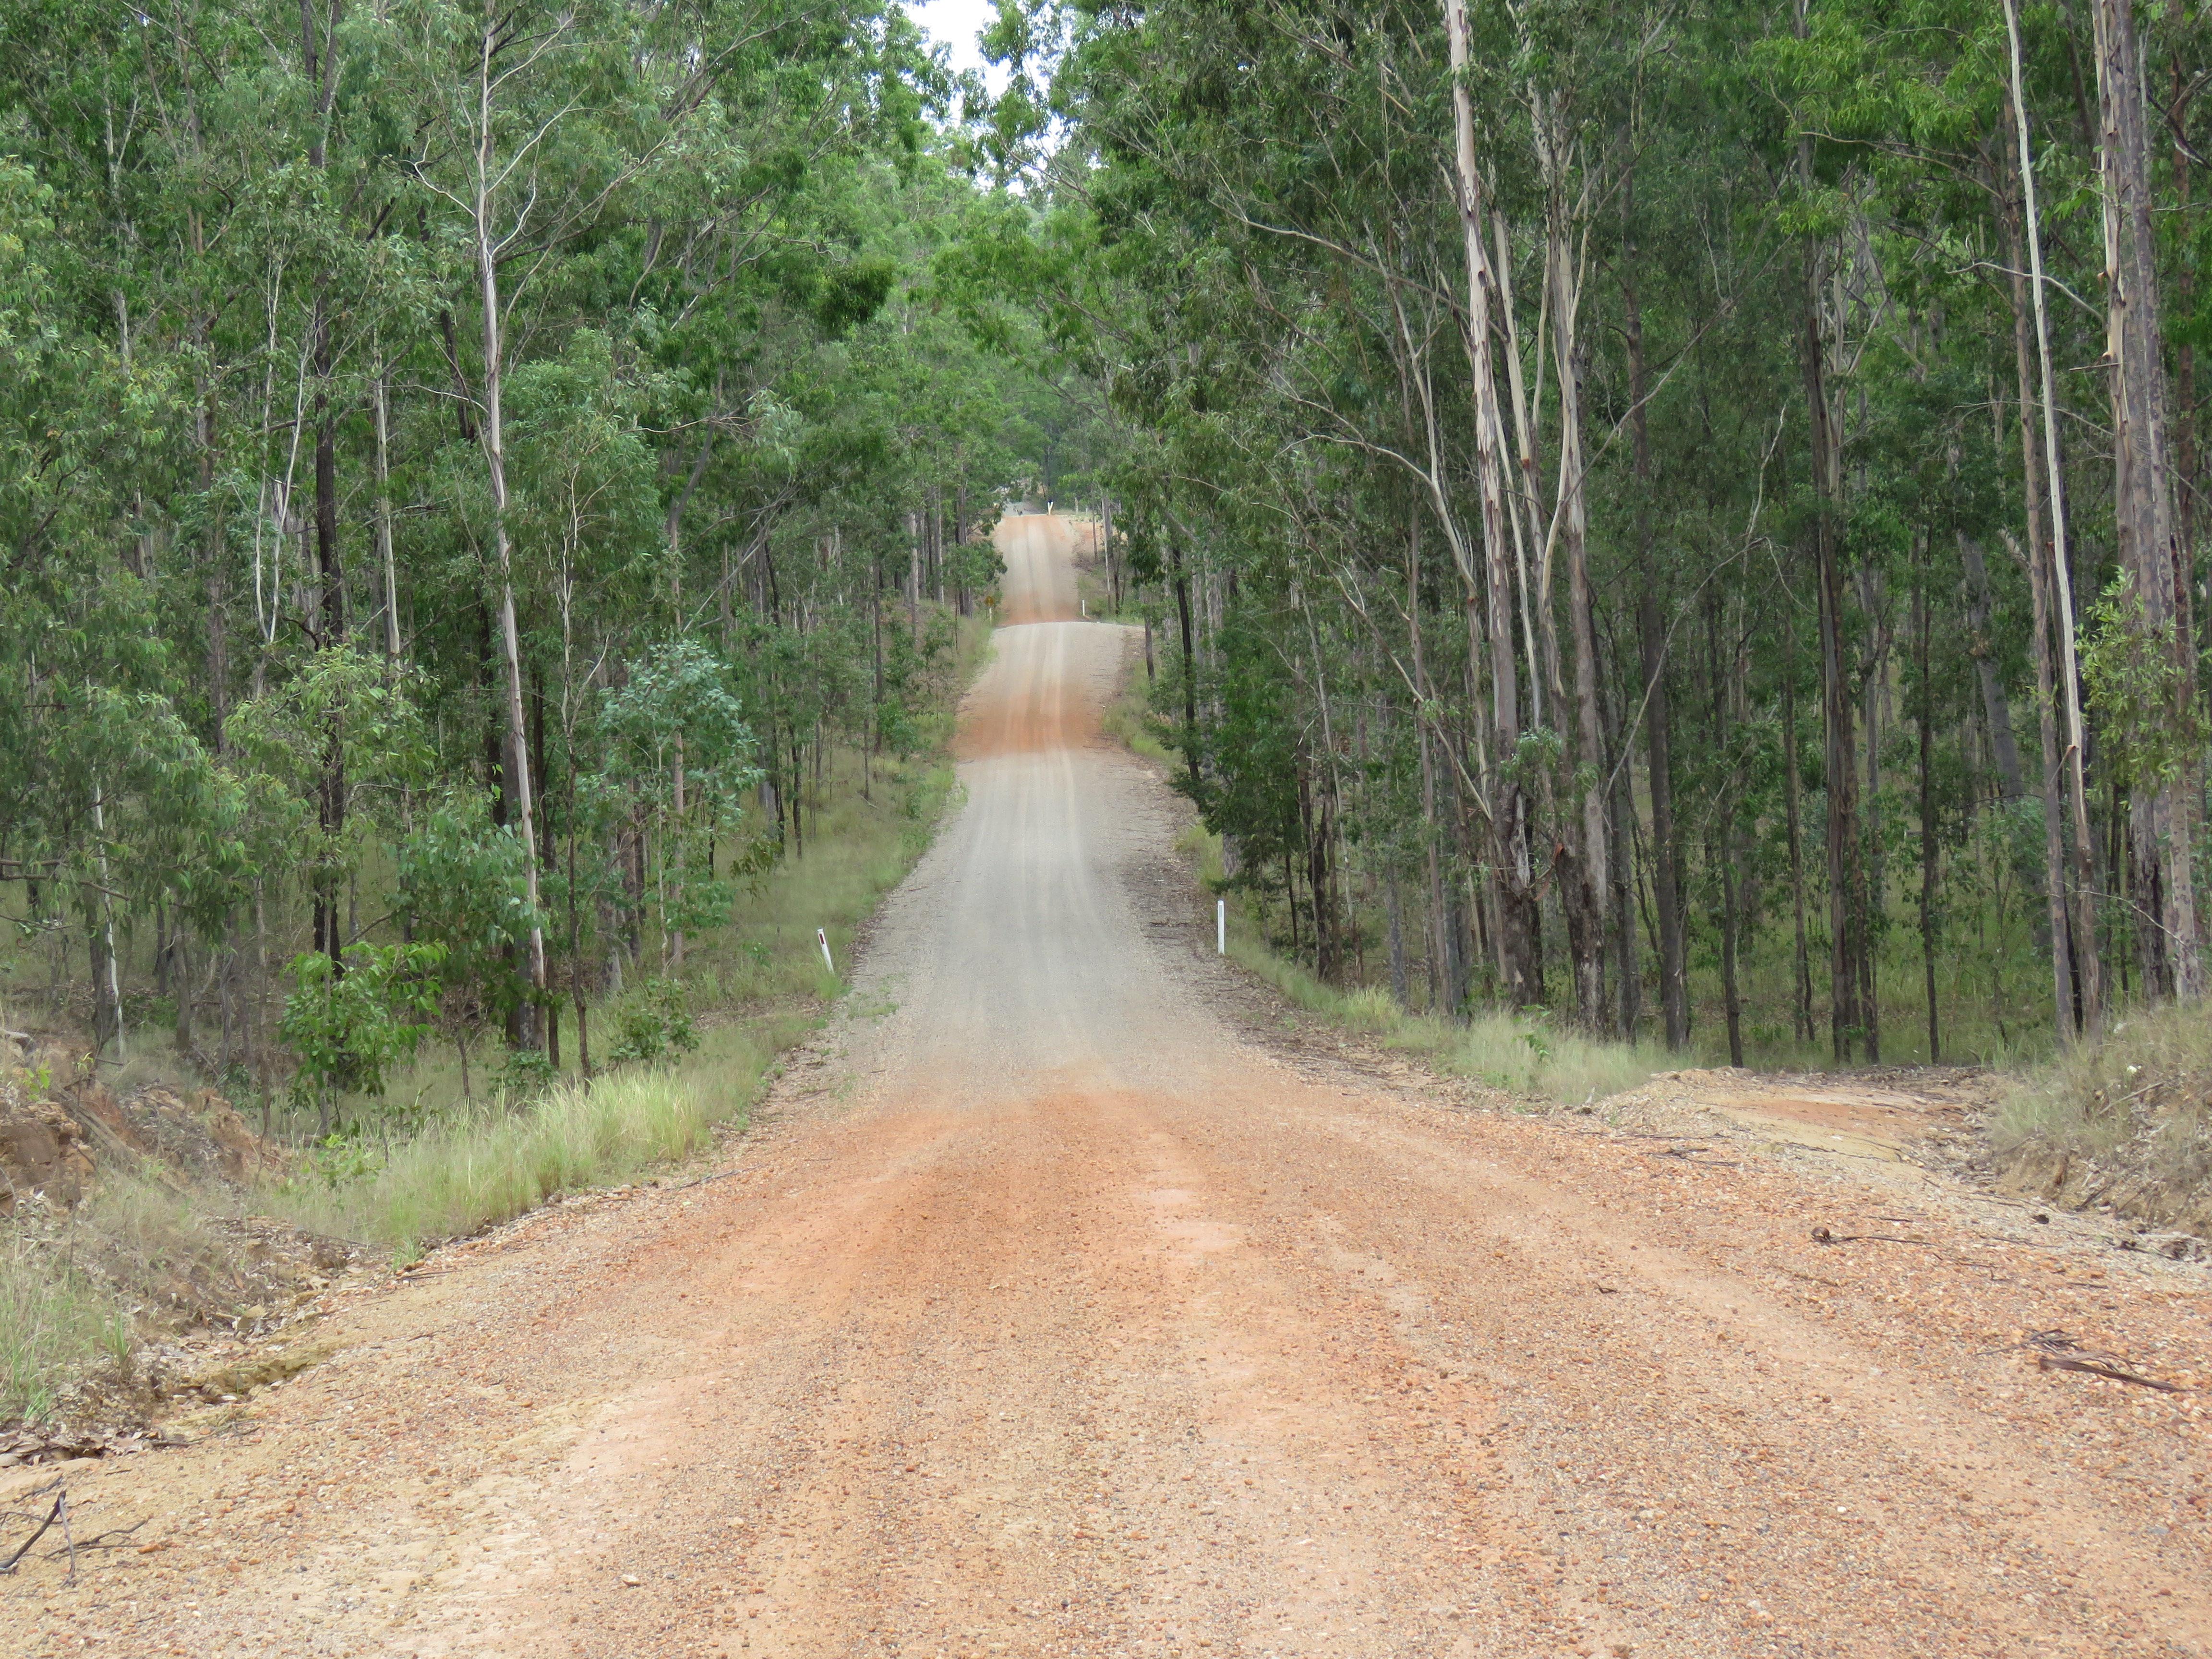 190326_blog_challenge_roads_lilydale_home5